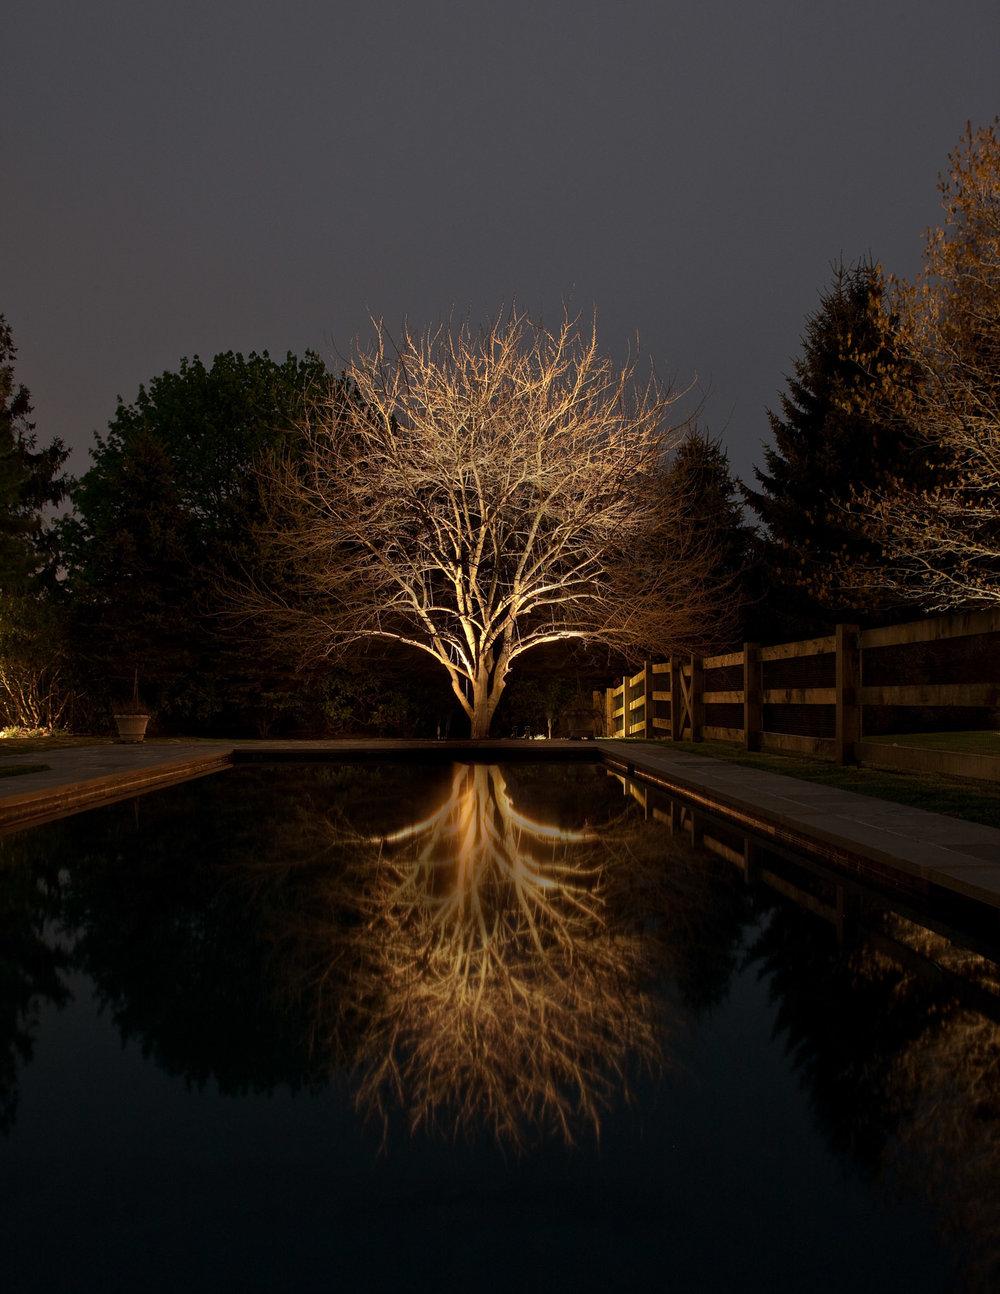 UP LIGHTING - ABOVE GRADE